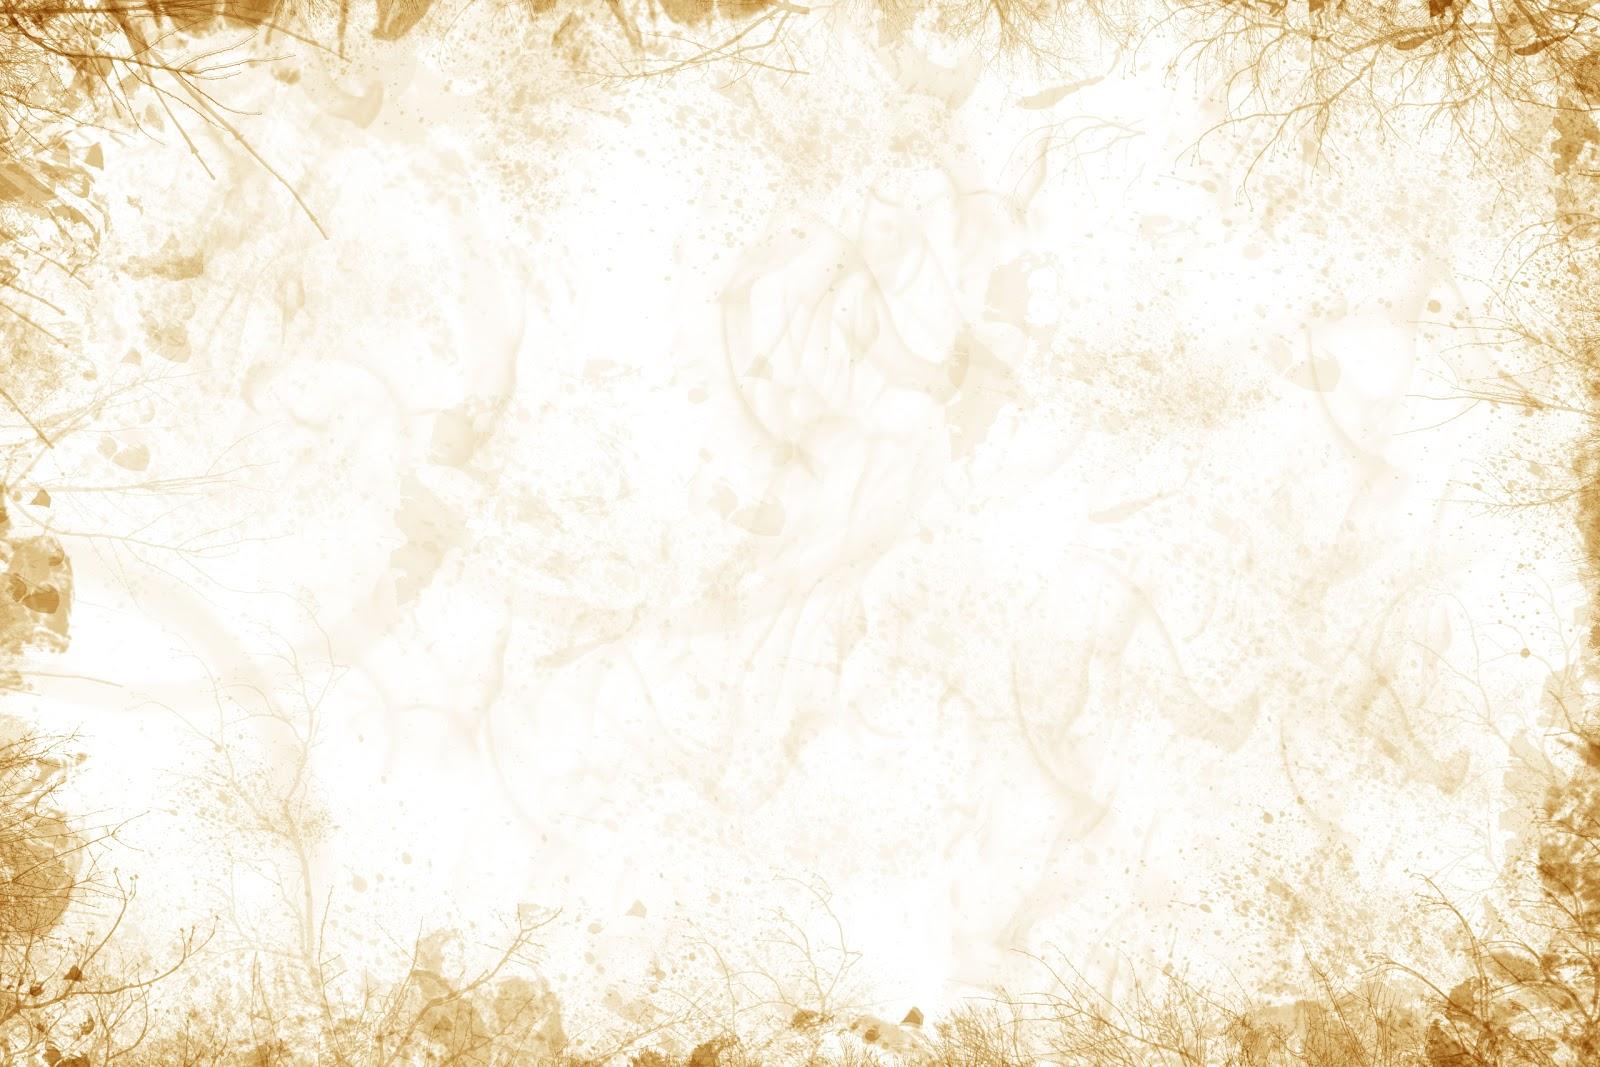 background wedding pics background texture images